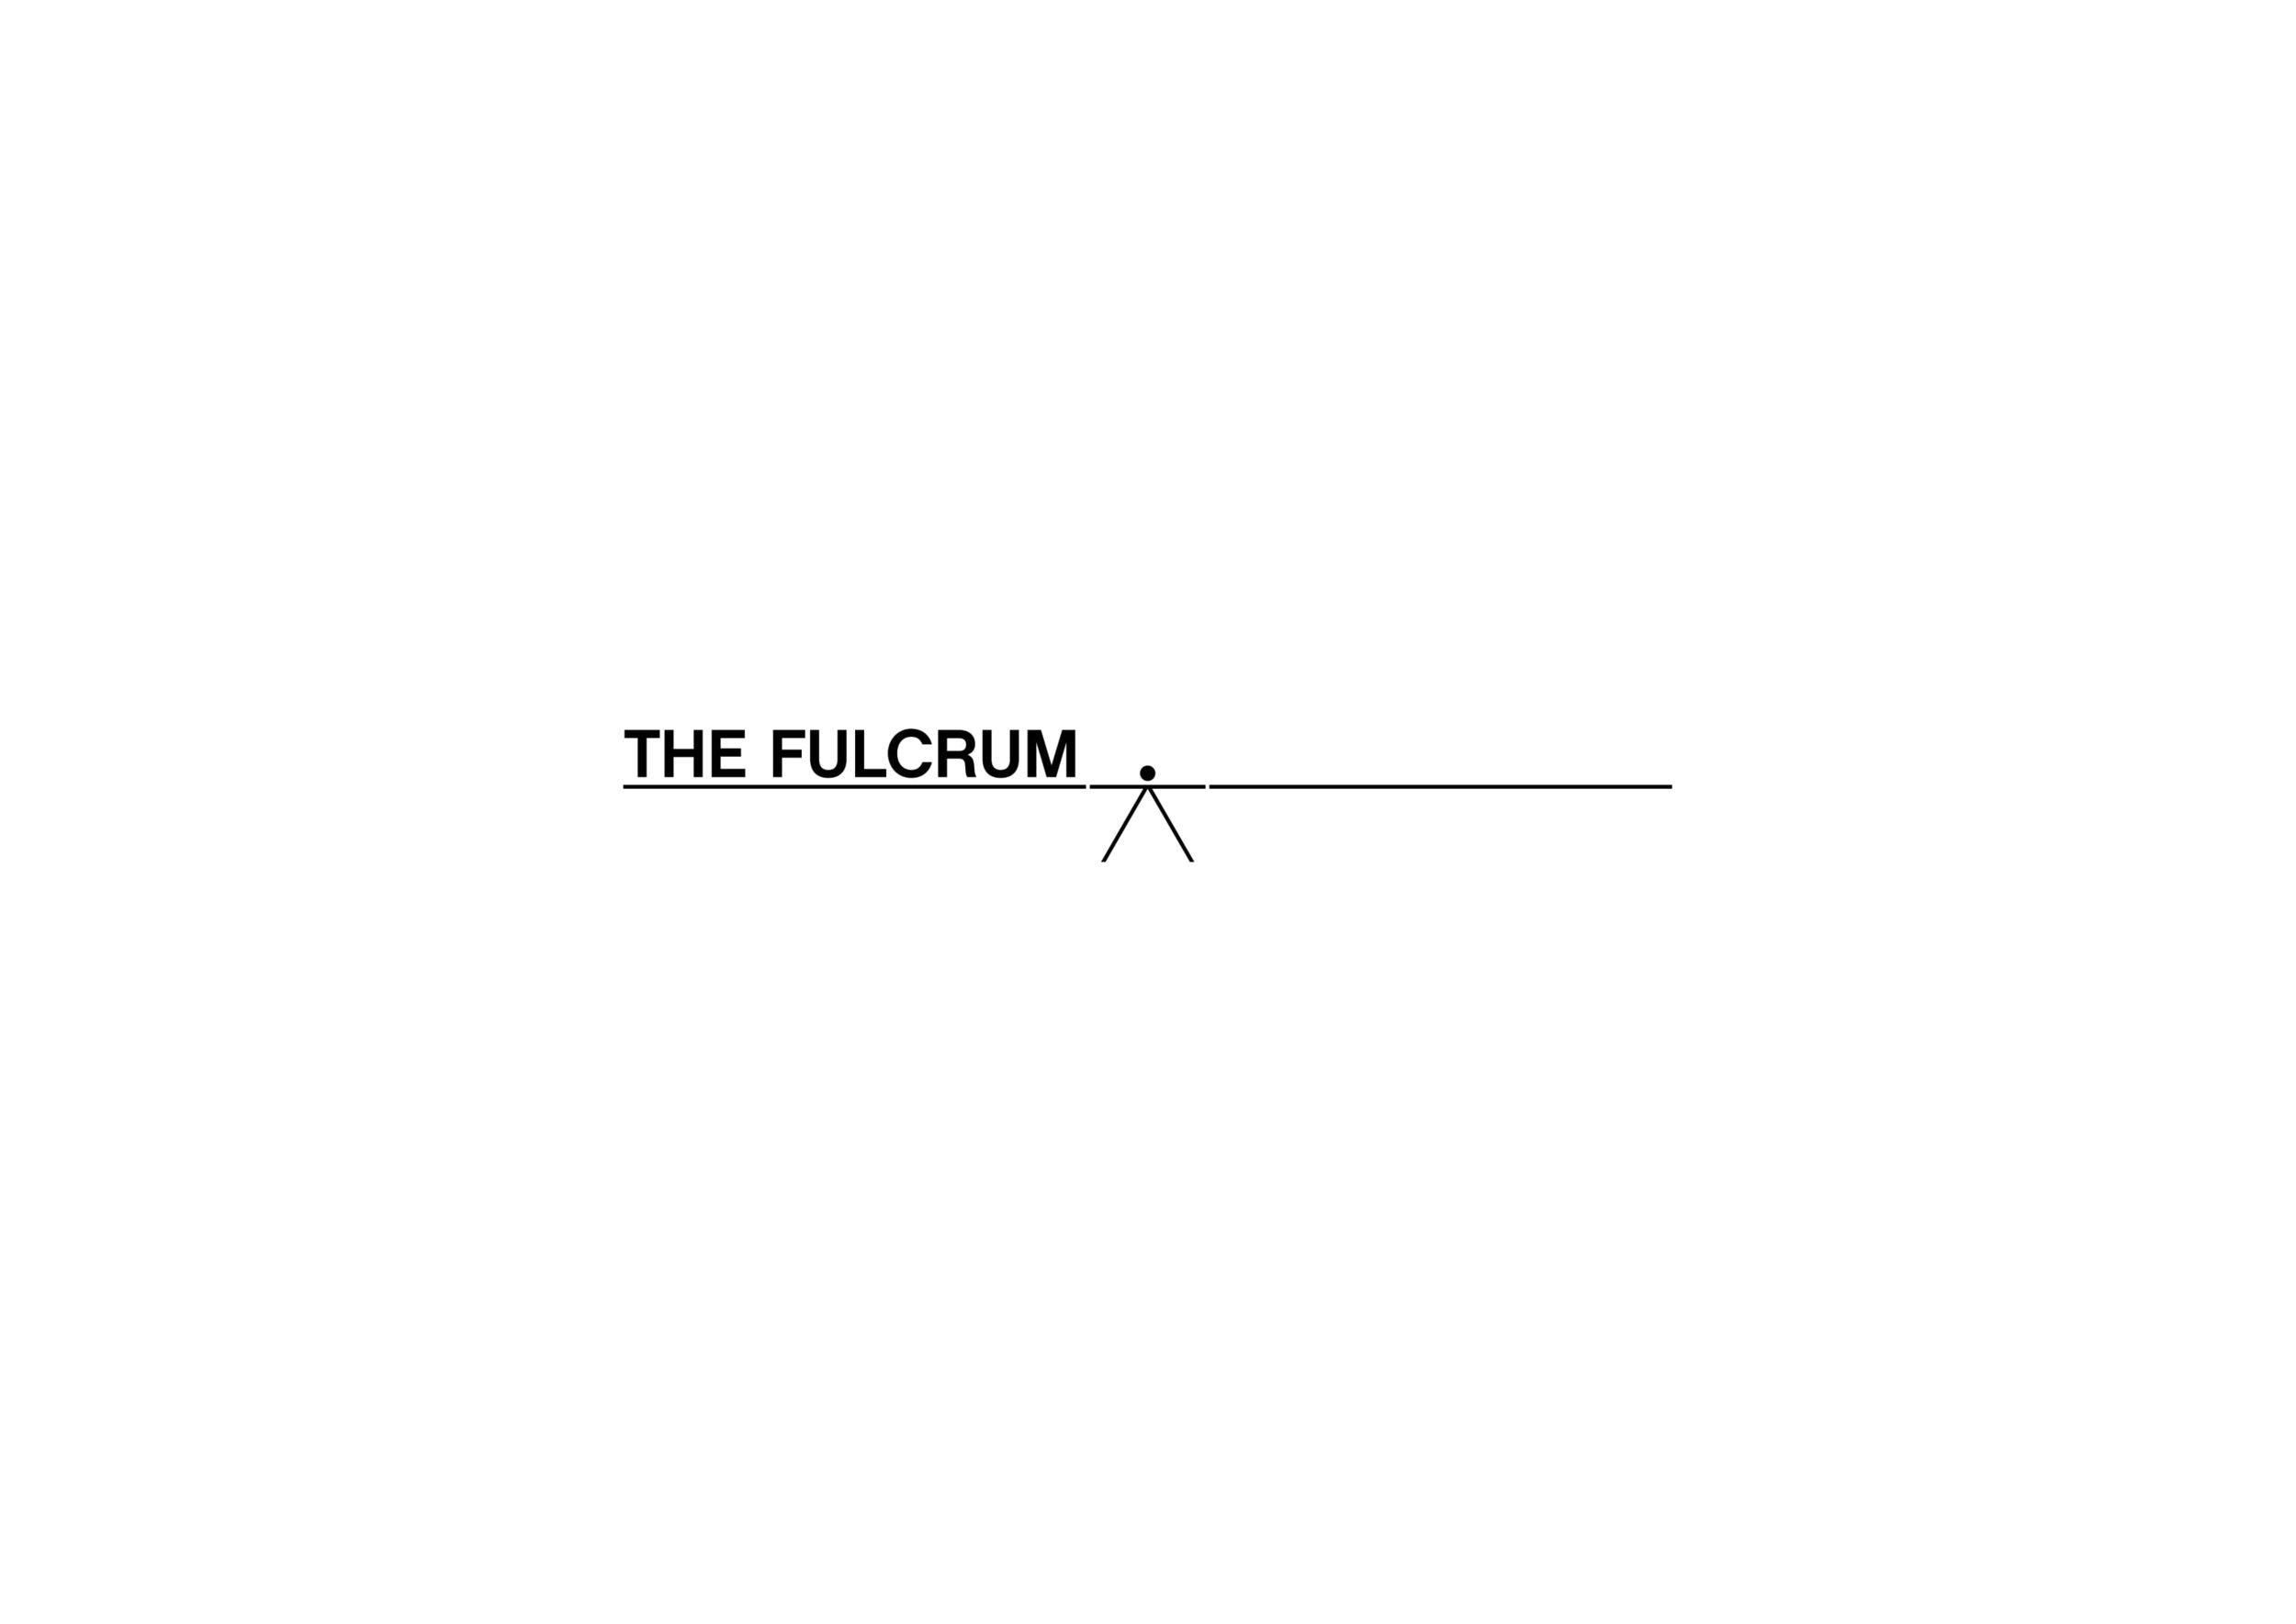 190207 FULCRUM CONCEPT WIP-12.jpg